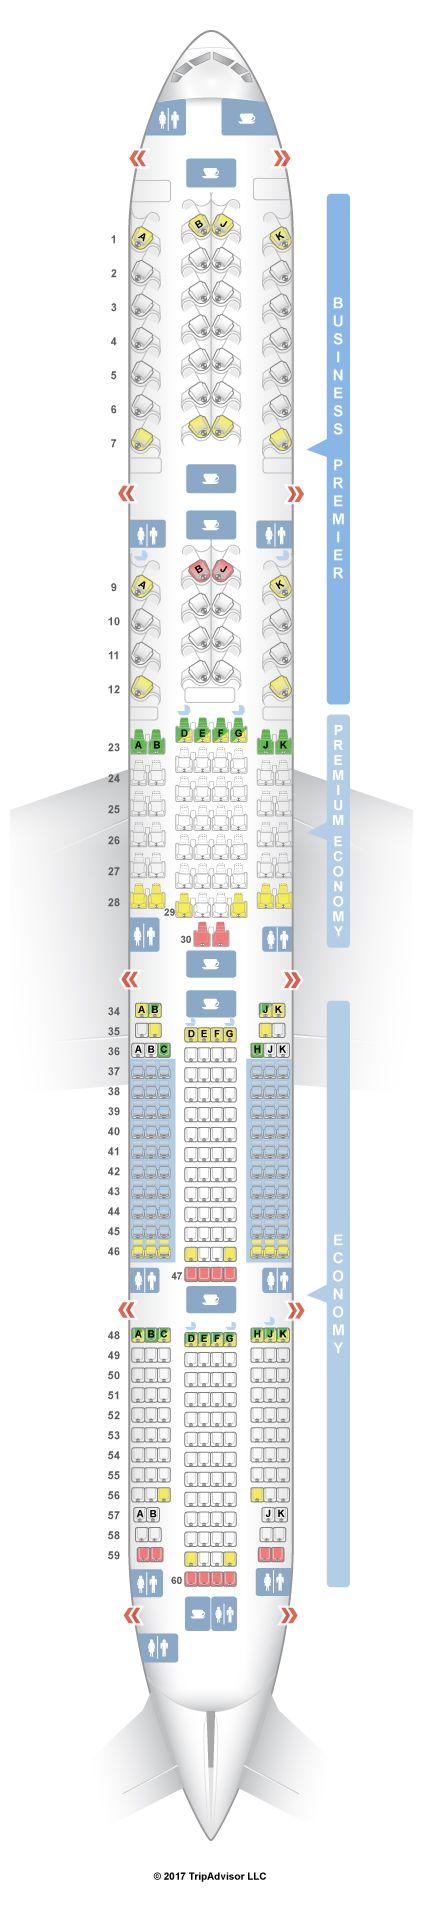 Seatguru Seat Map Air New Zealand Boeing 777 300 773 With